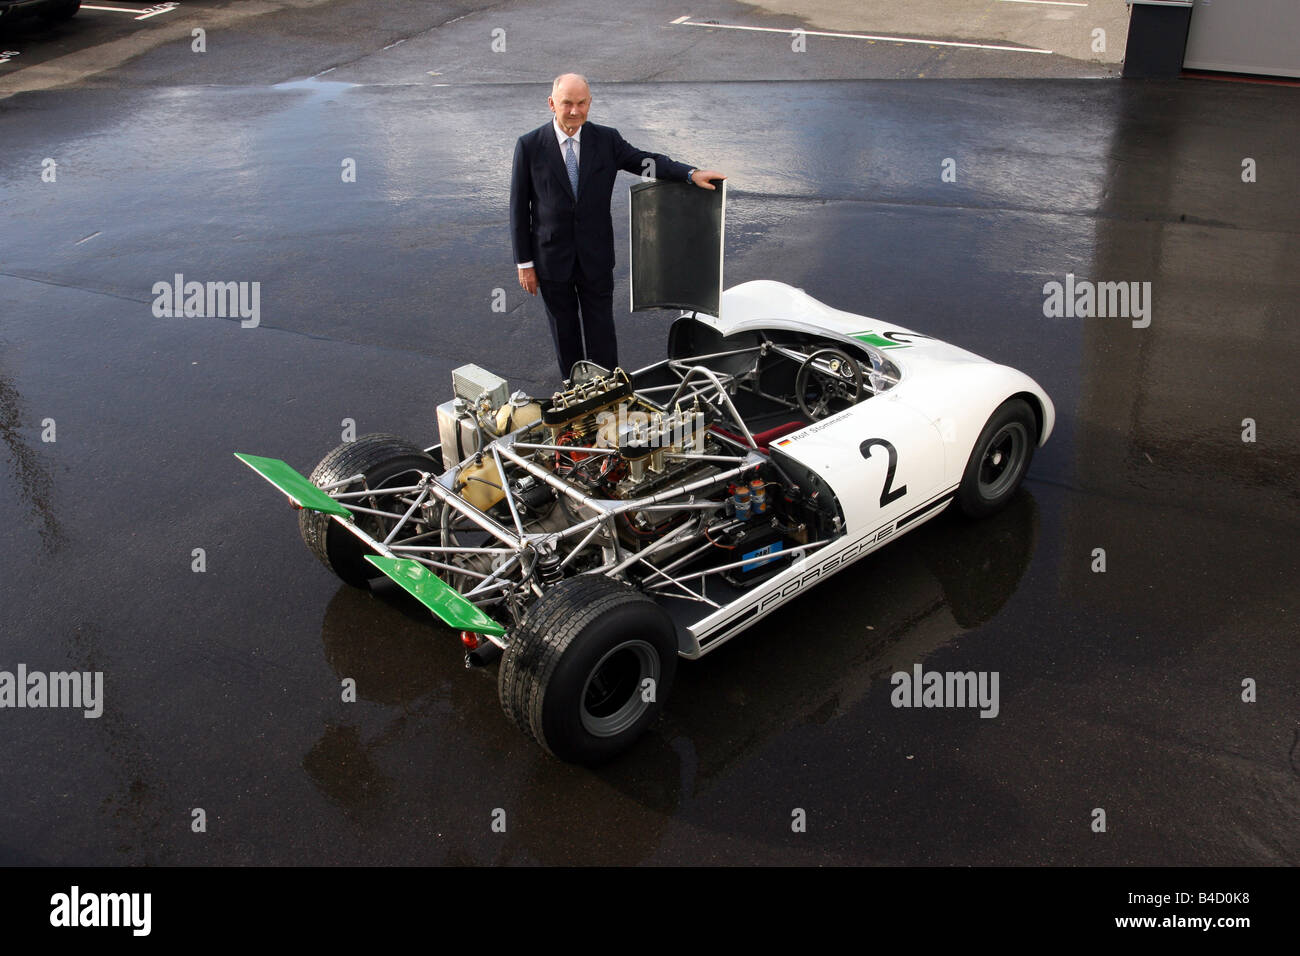 Ferdinand Piech with Porsche Bergspyder 909 from the year 1968 - Stock Image